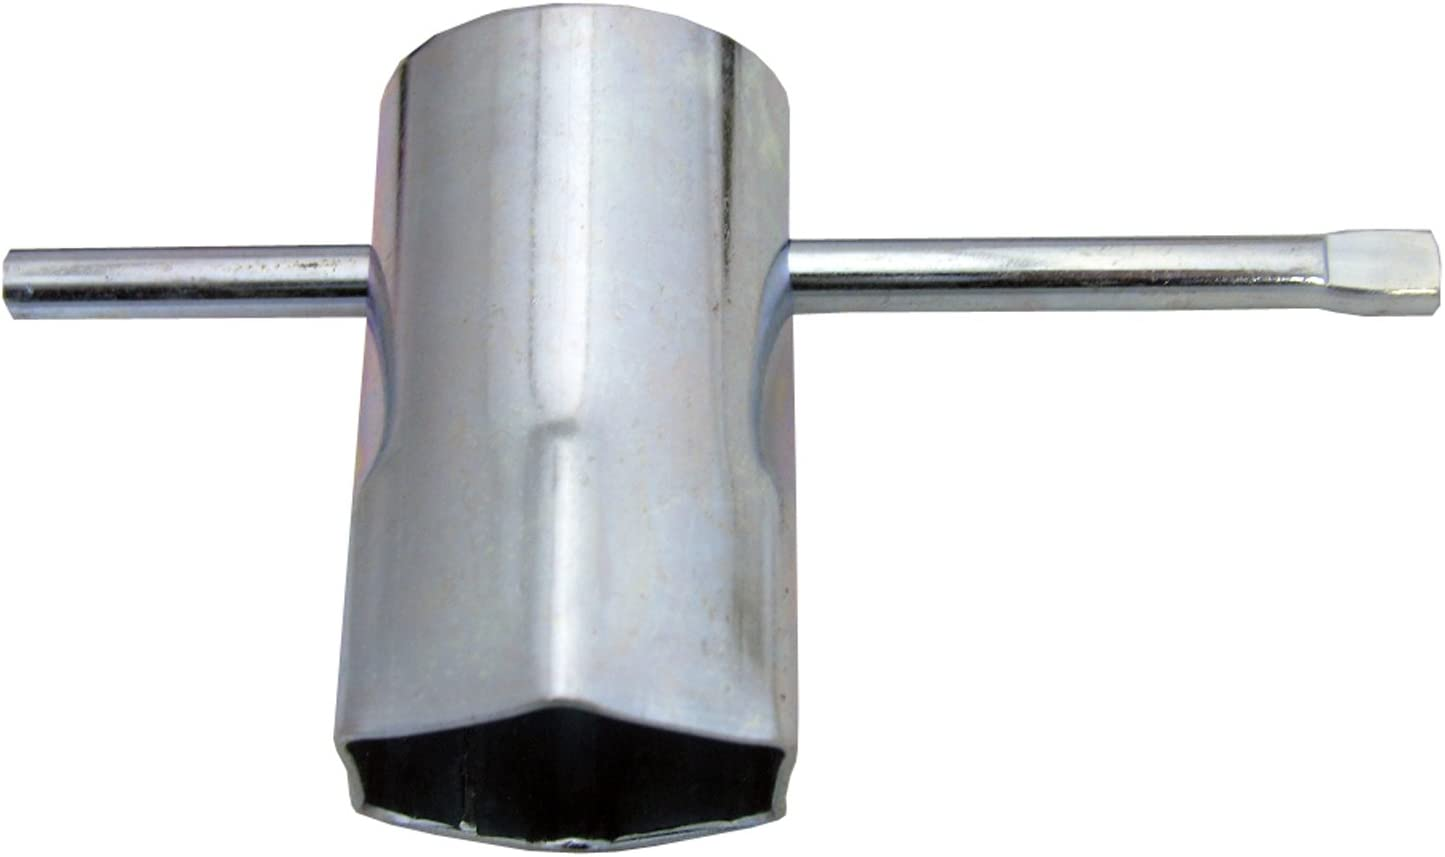 Lasco 40 1601 Heavy Duty Metal Water Heater Element Wrench 1 1 2 Inch Amazon Com